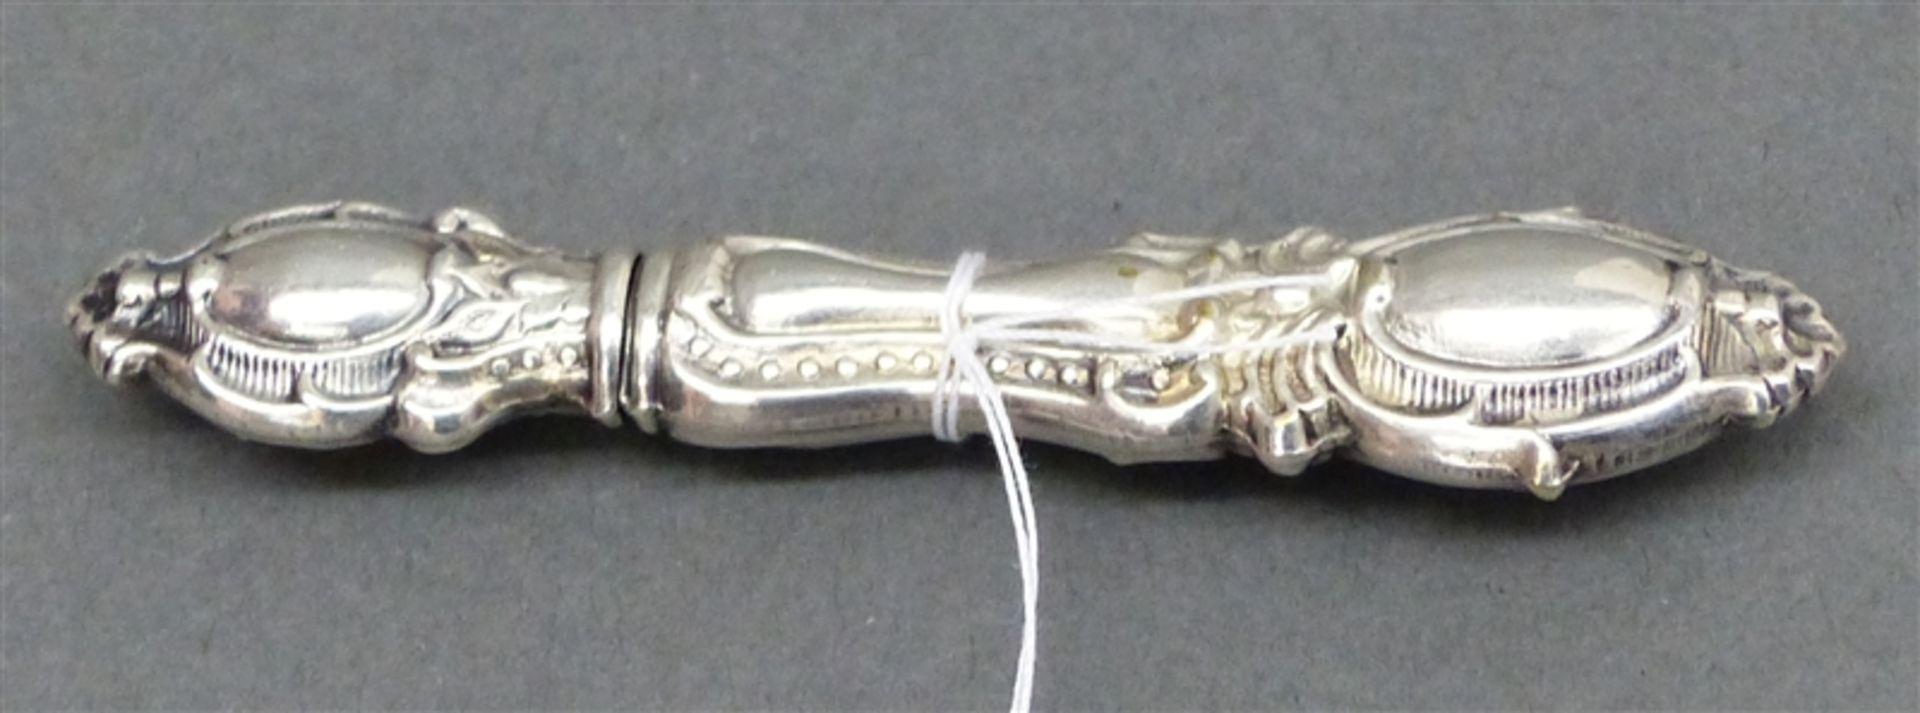 Nadelbehälter um 1880, Silber, Reliefdekor, l 7 cm,